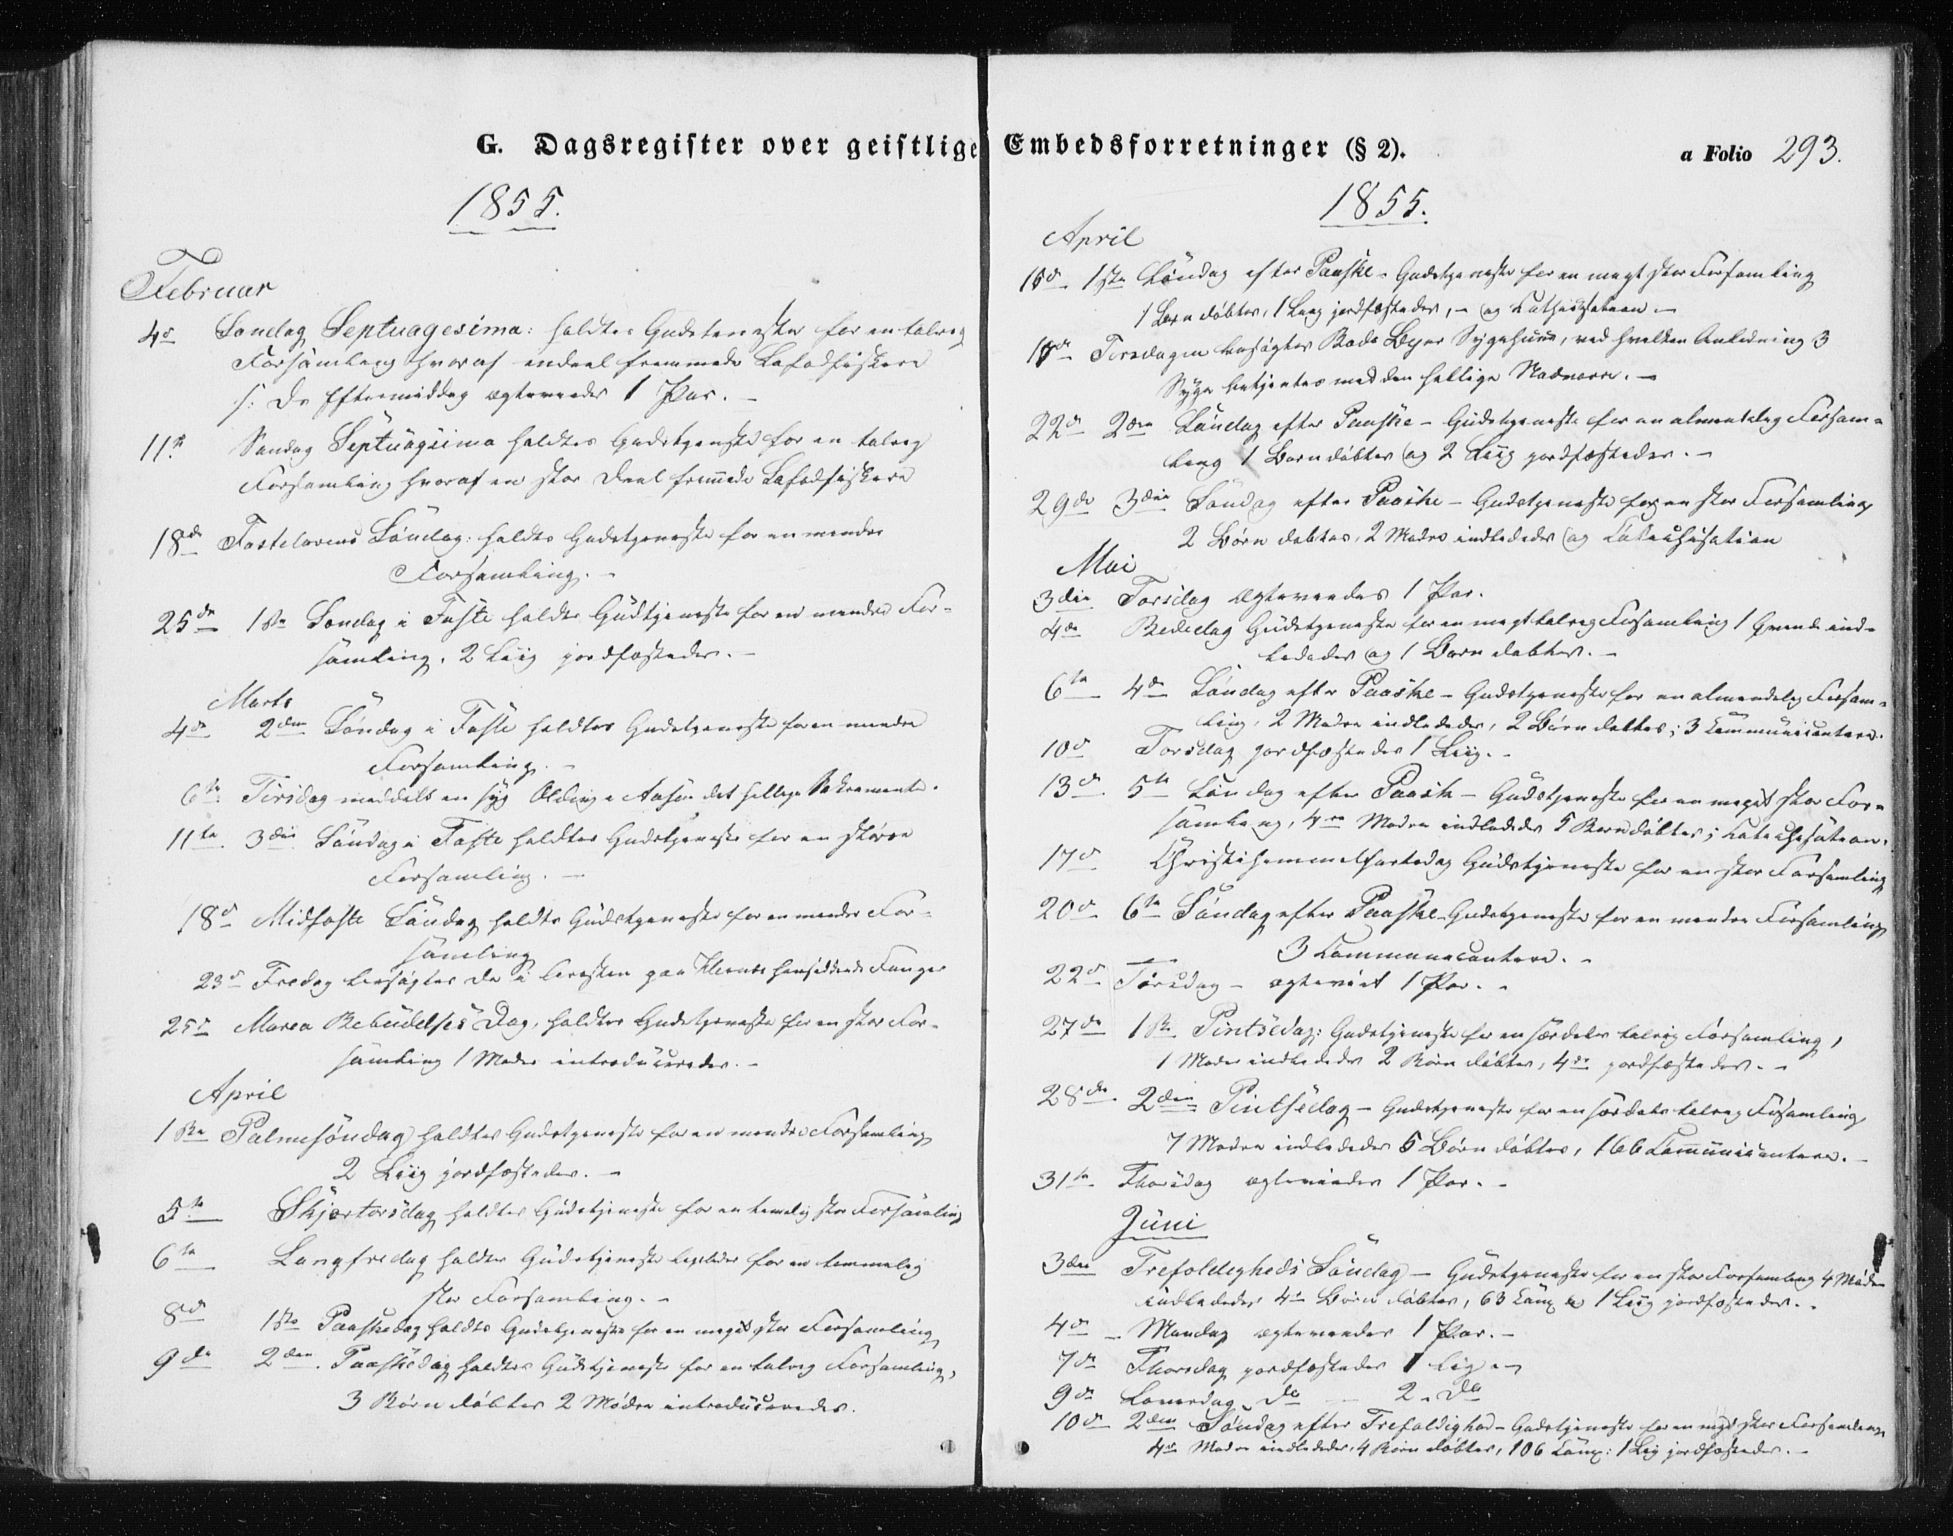 SAT, Ministerialprotokoller, klokkerbøker og fødselsregistre - Nordland, 801/L0028: Klokkerbok nr. 801C03, 1855-1867, s. 293